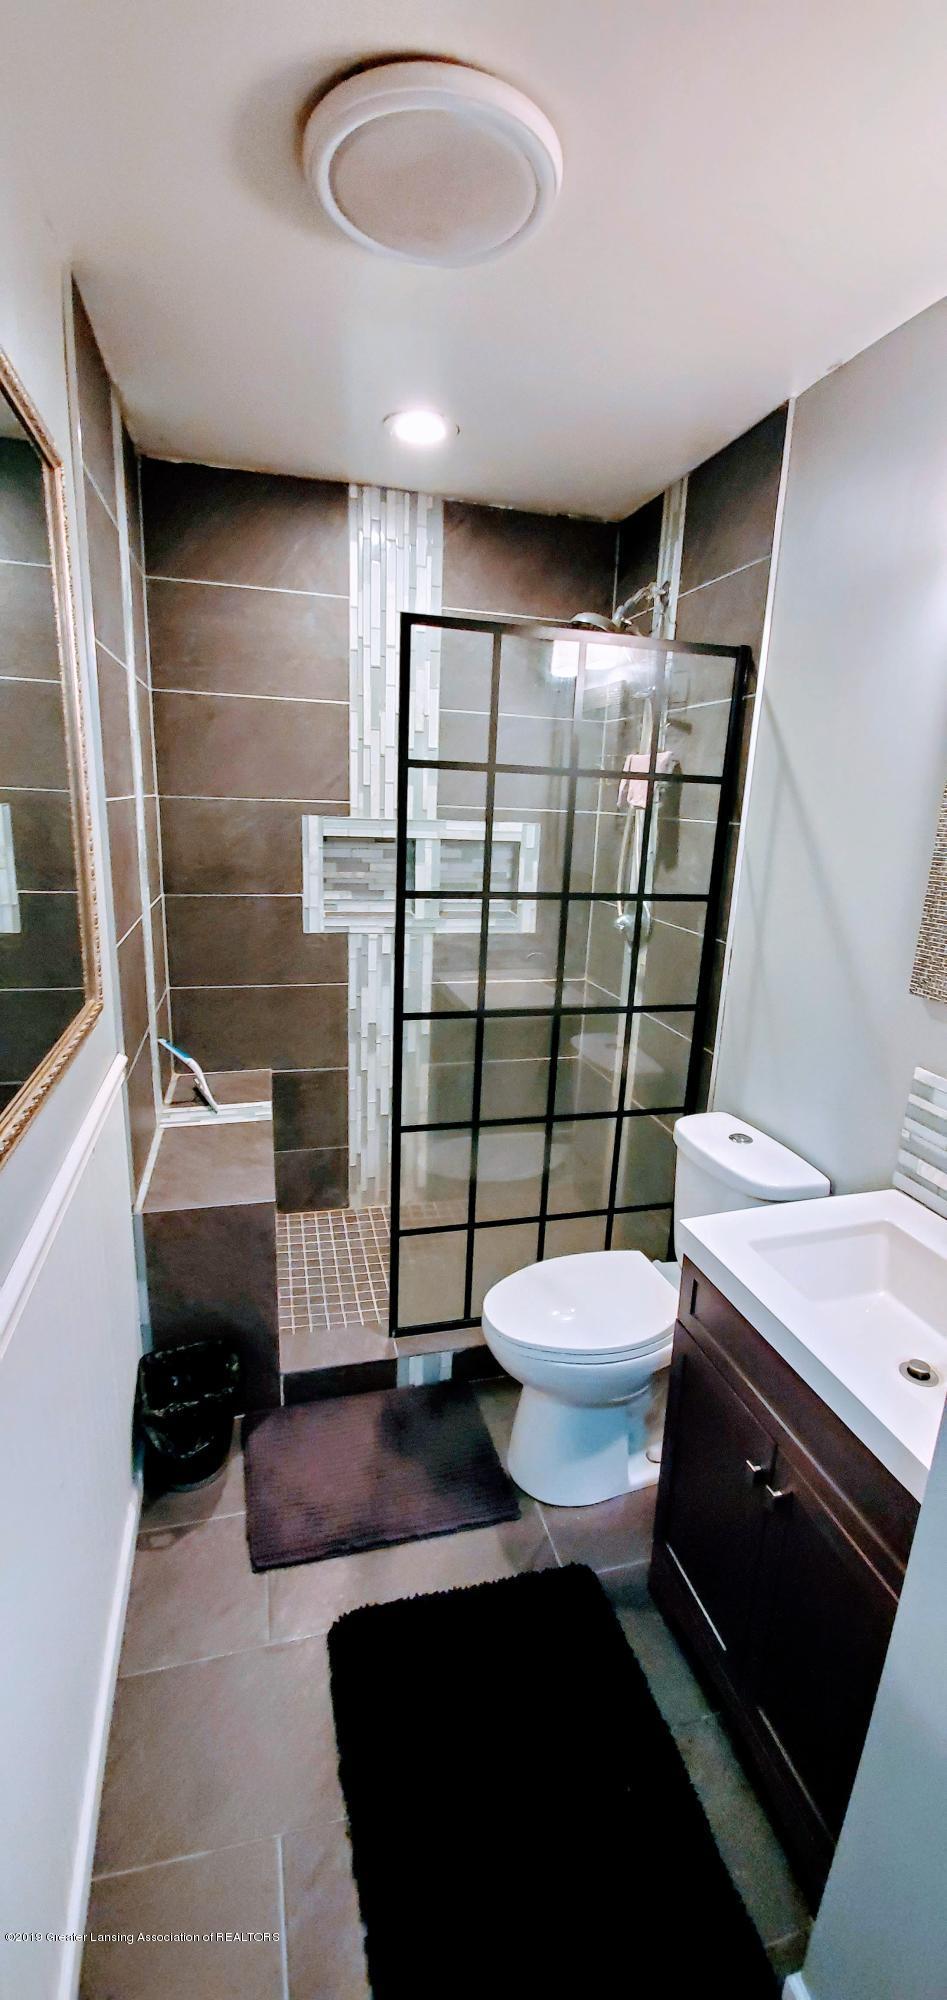 3924 Wedgewood Dr - Bath Room - 7